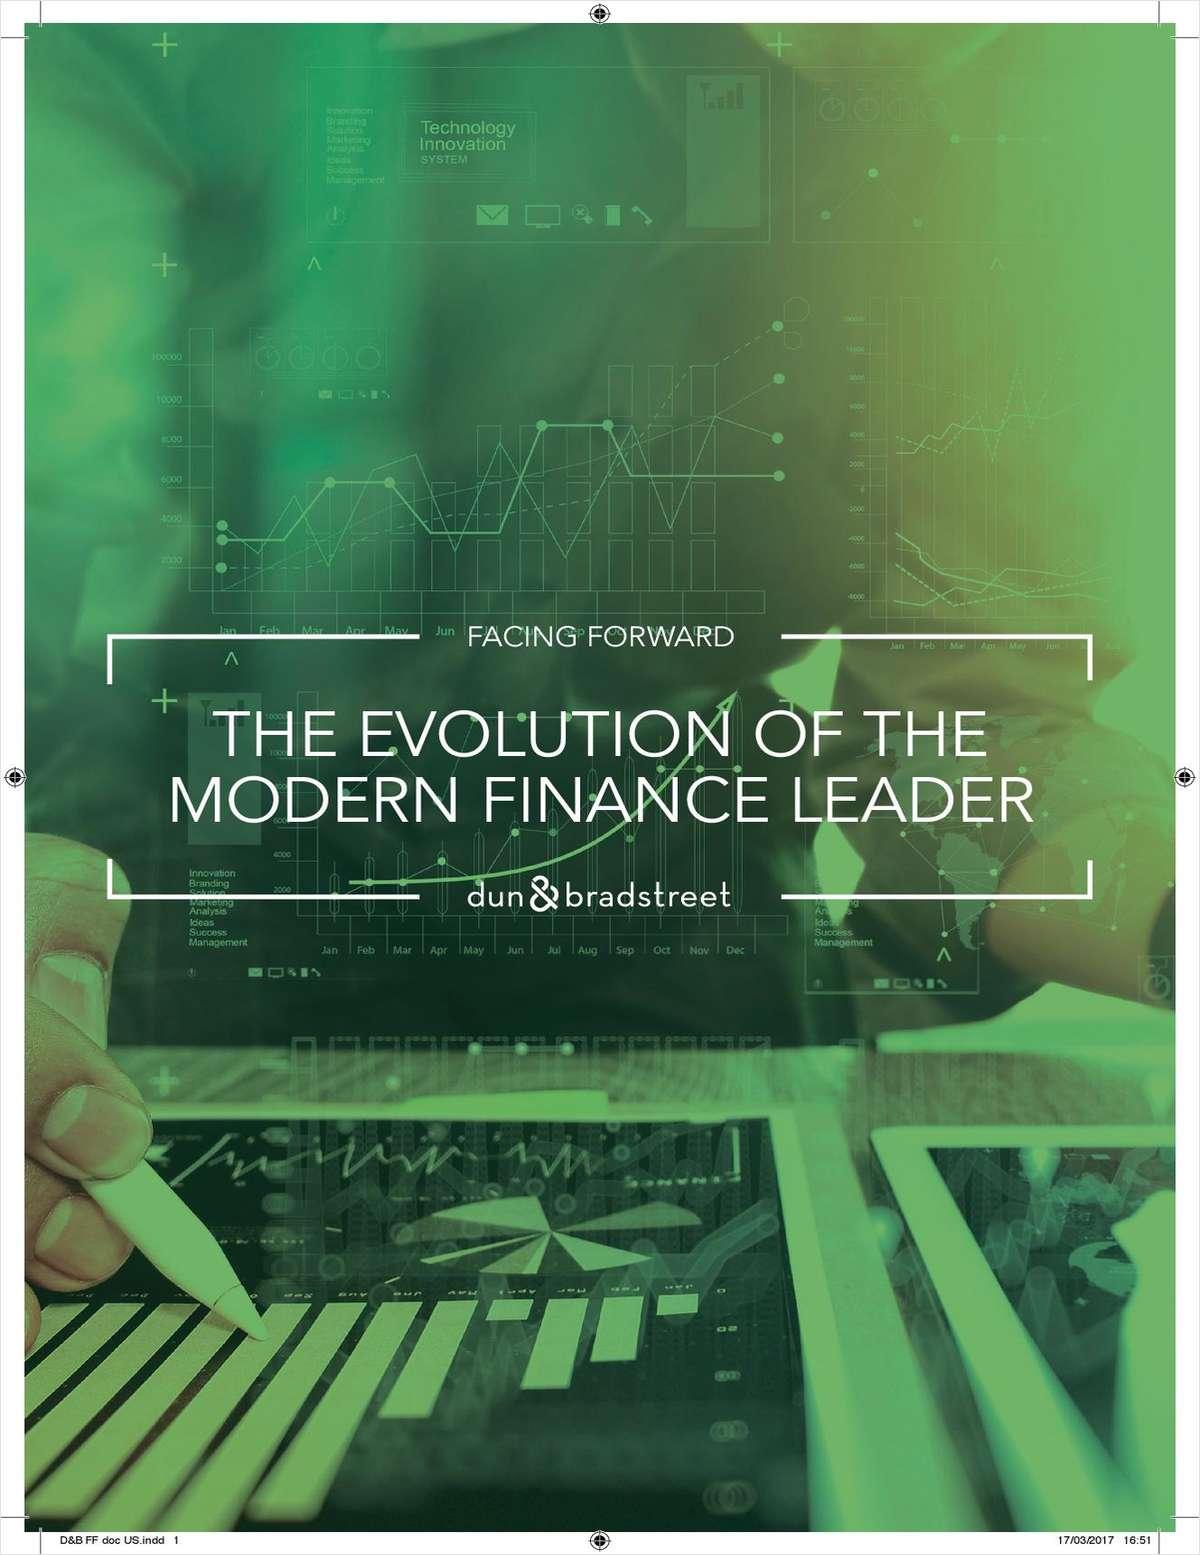 The Evolution of the Modern Finance Leader